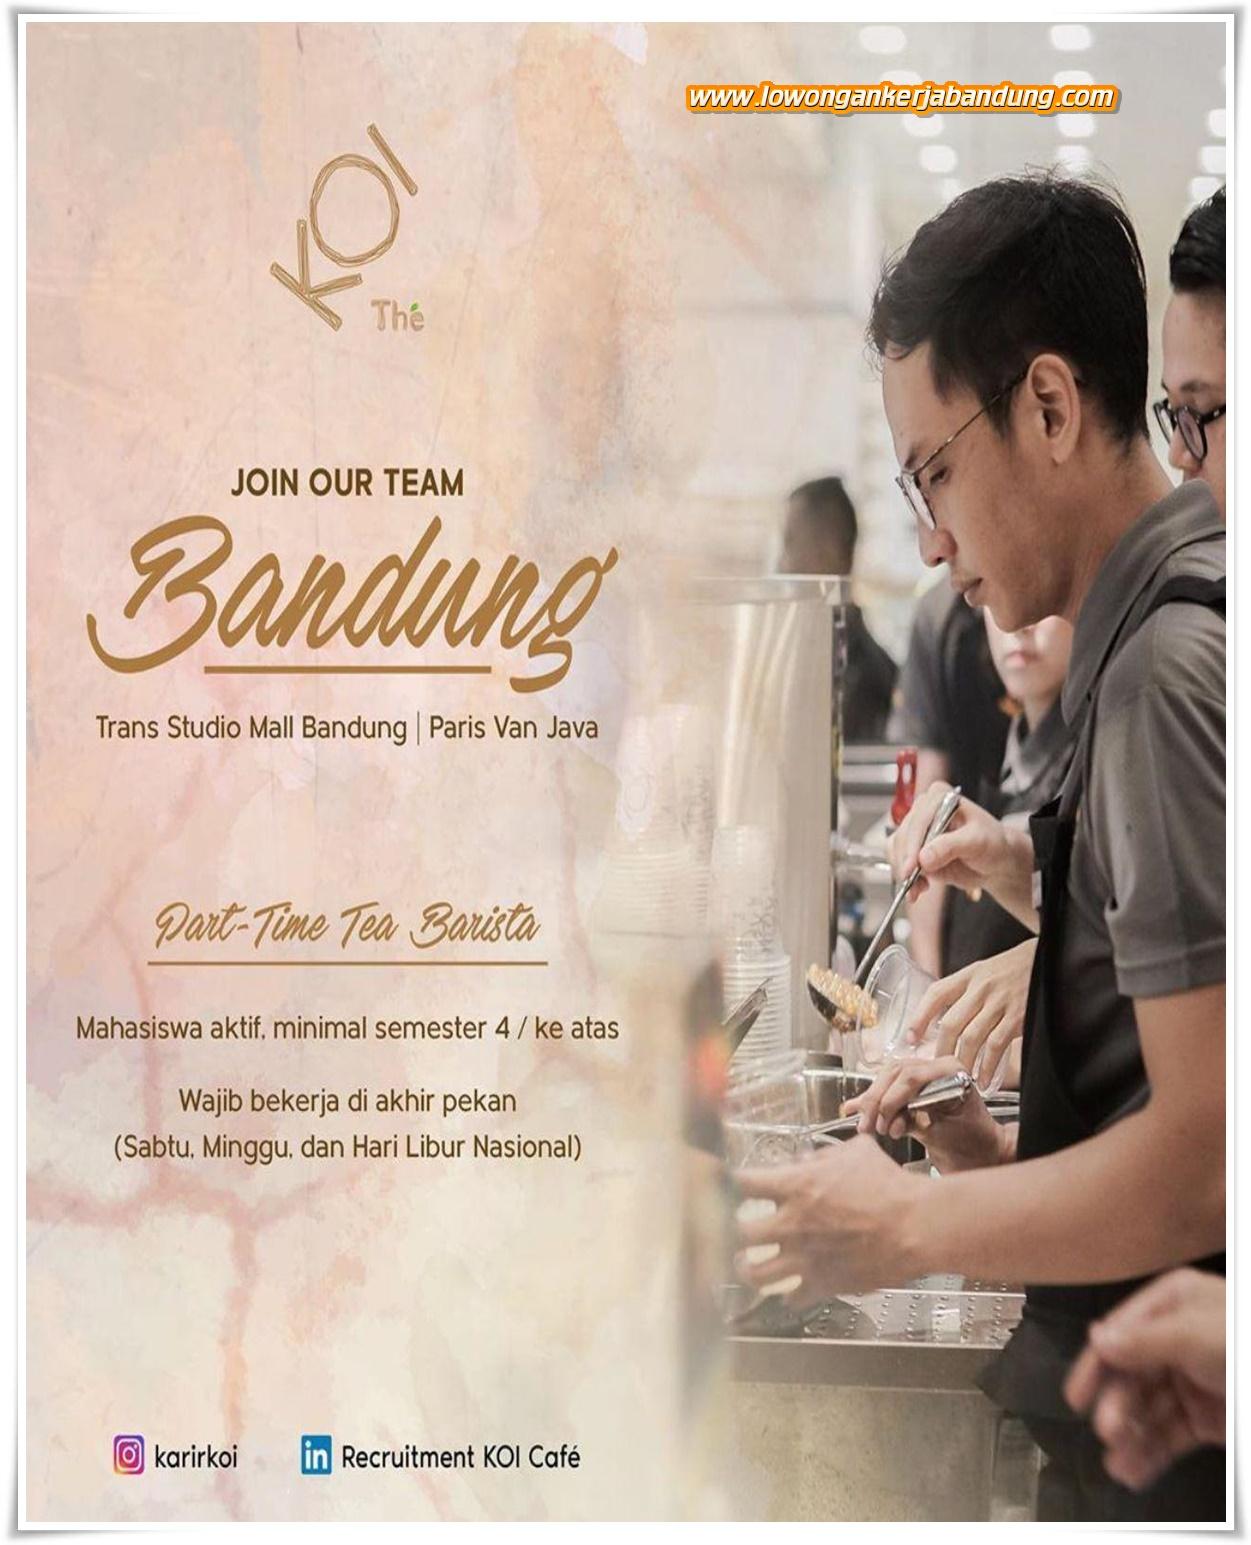 Lowongan Kerja Part Time Barista Koi Cafe Bandung Lowongan Kerja Bandung Lowongankerjabandung Com